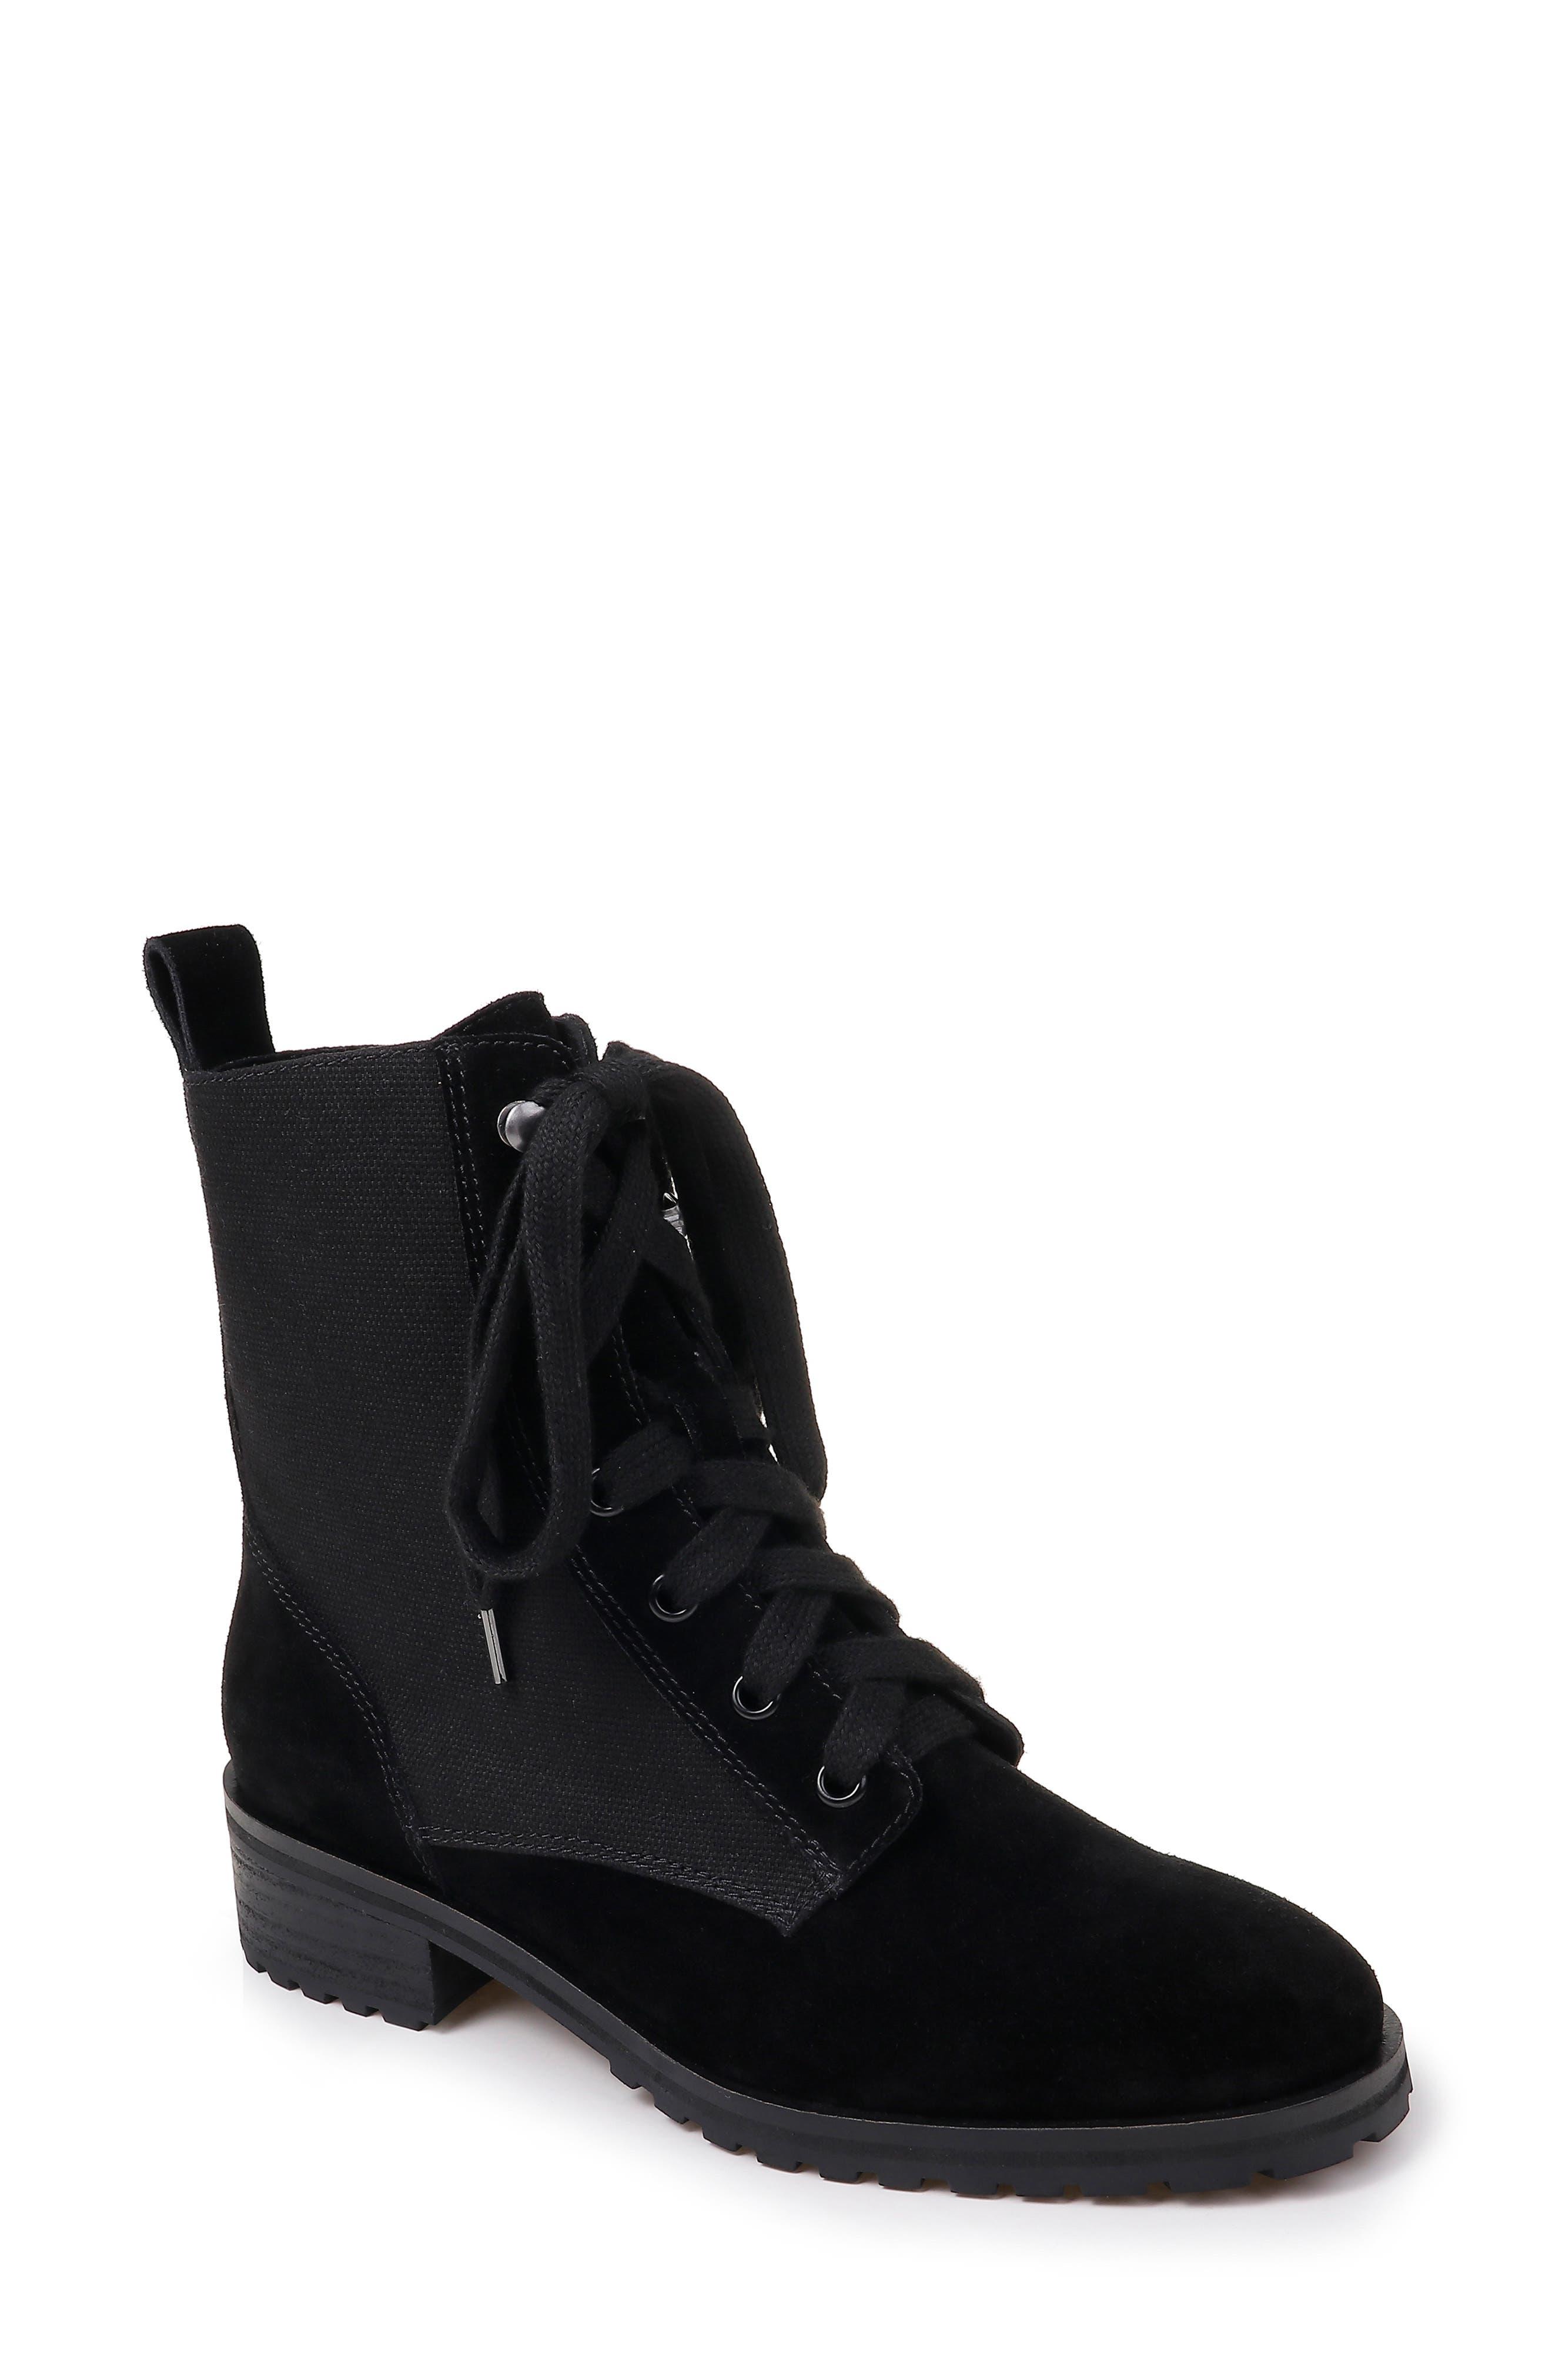 Splendid Hermilla Lace-Up Boot, Black